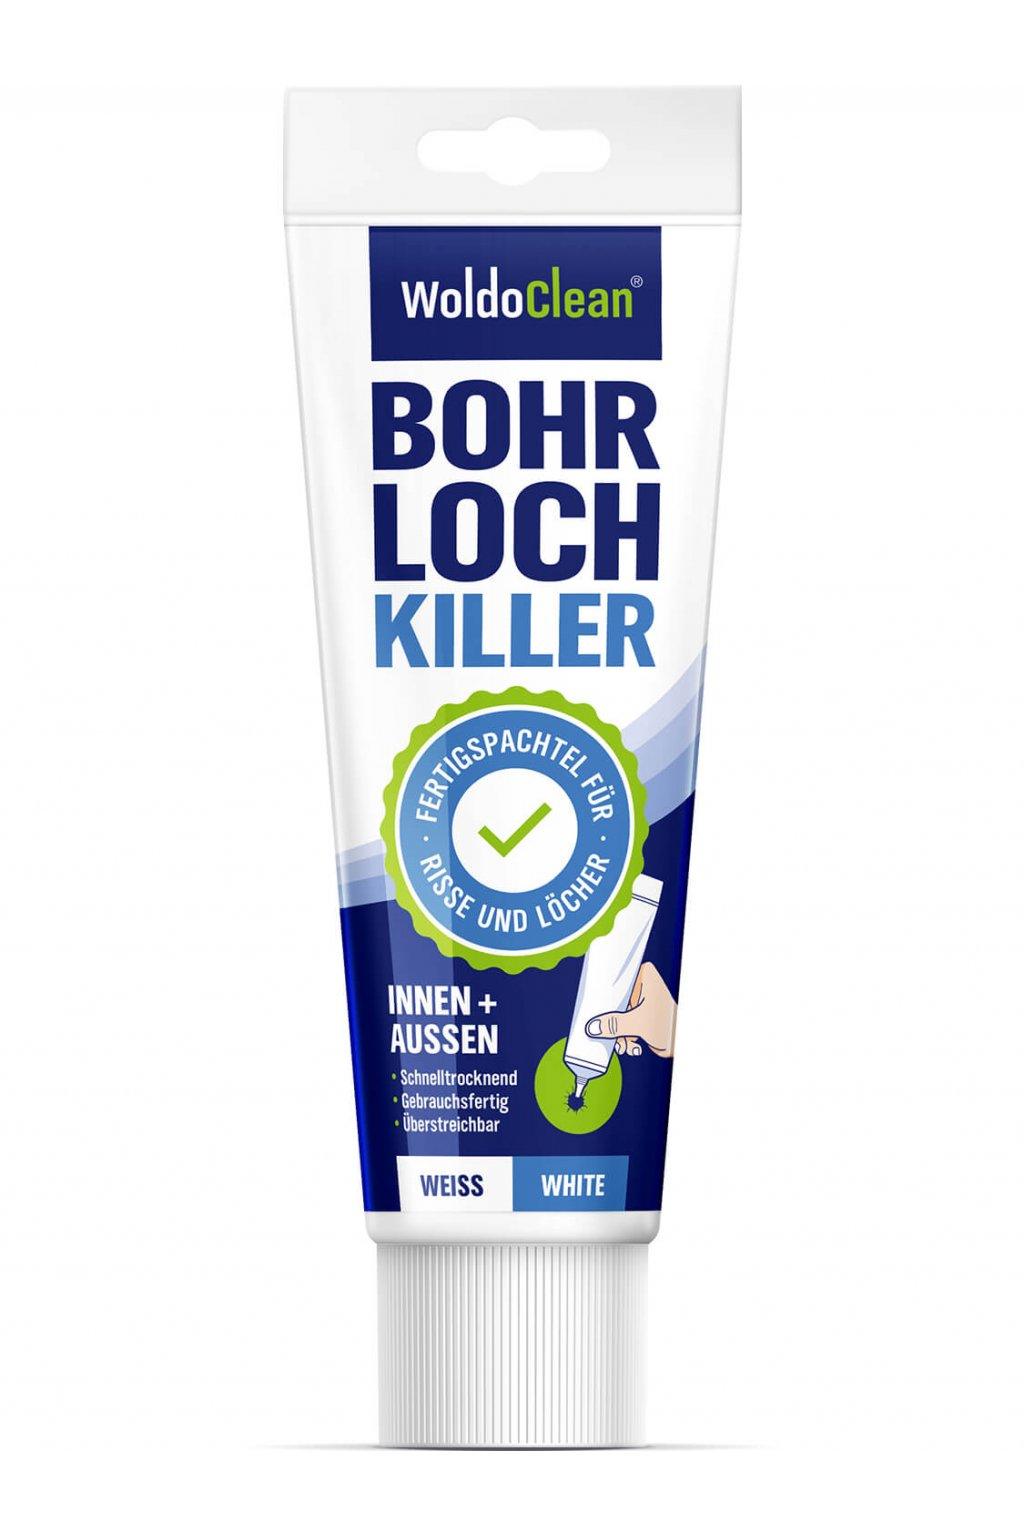 WoldoClean 210222 Bohrloch Killer 400g Preview